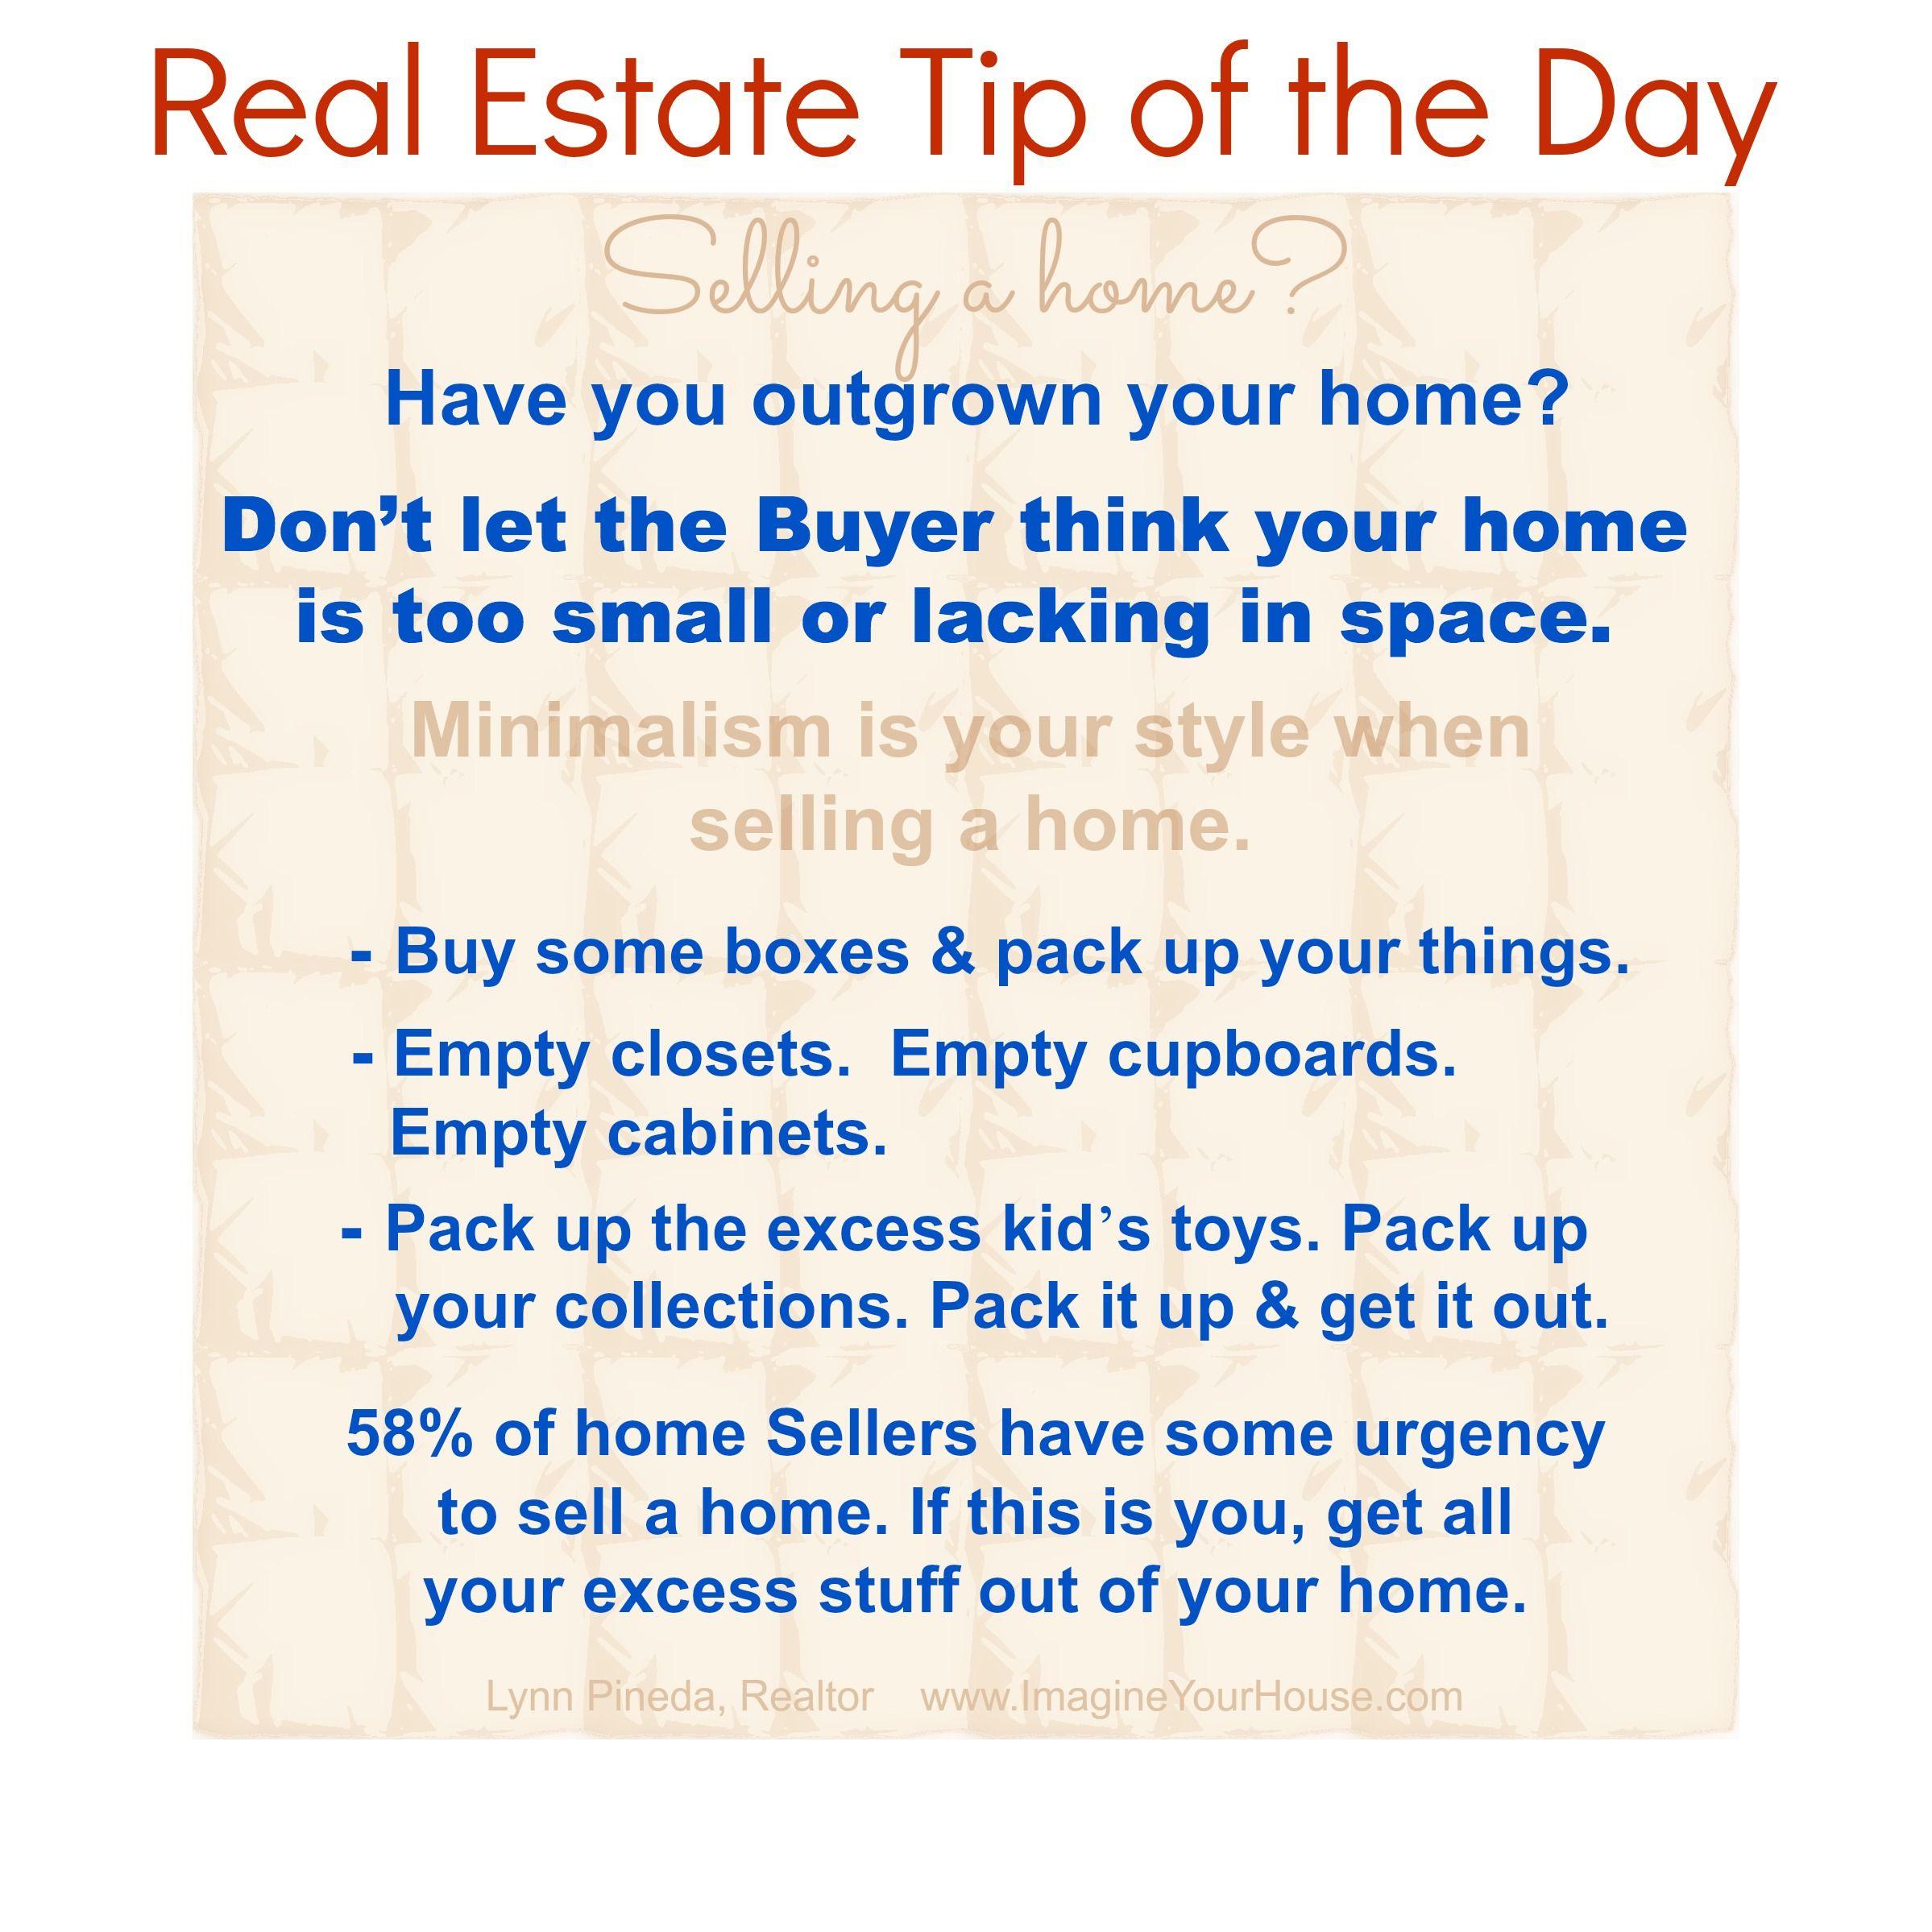 Real Estate Tip Of The Day Nov 7 2013 Real Estate Advice Real Estate Tips Real Estate Humor